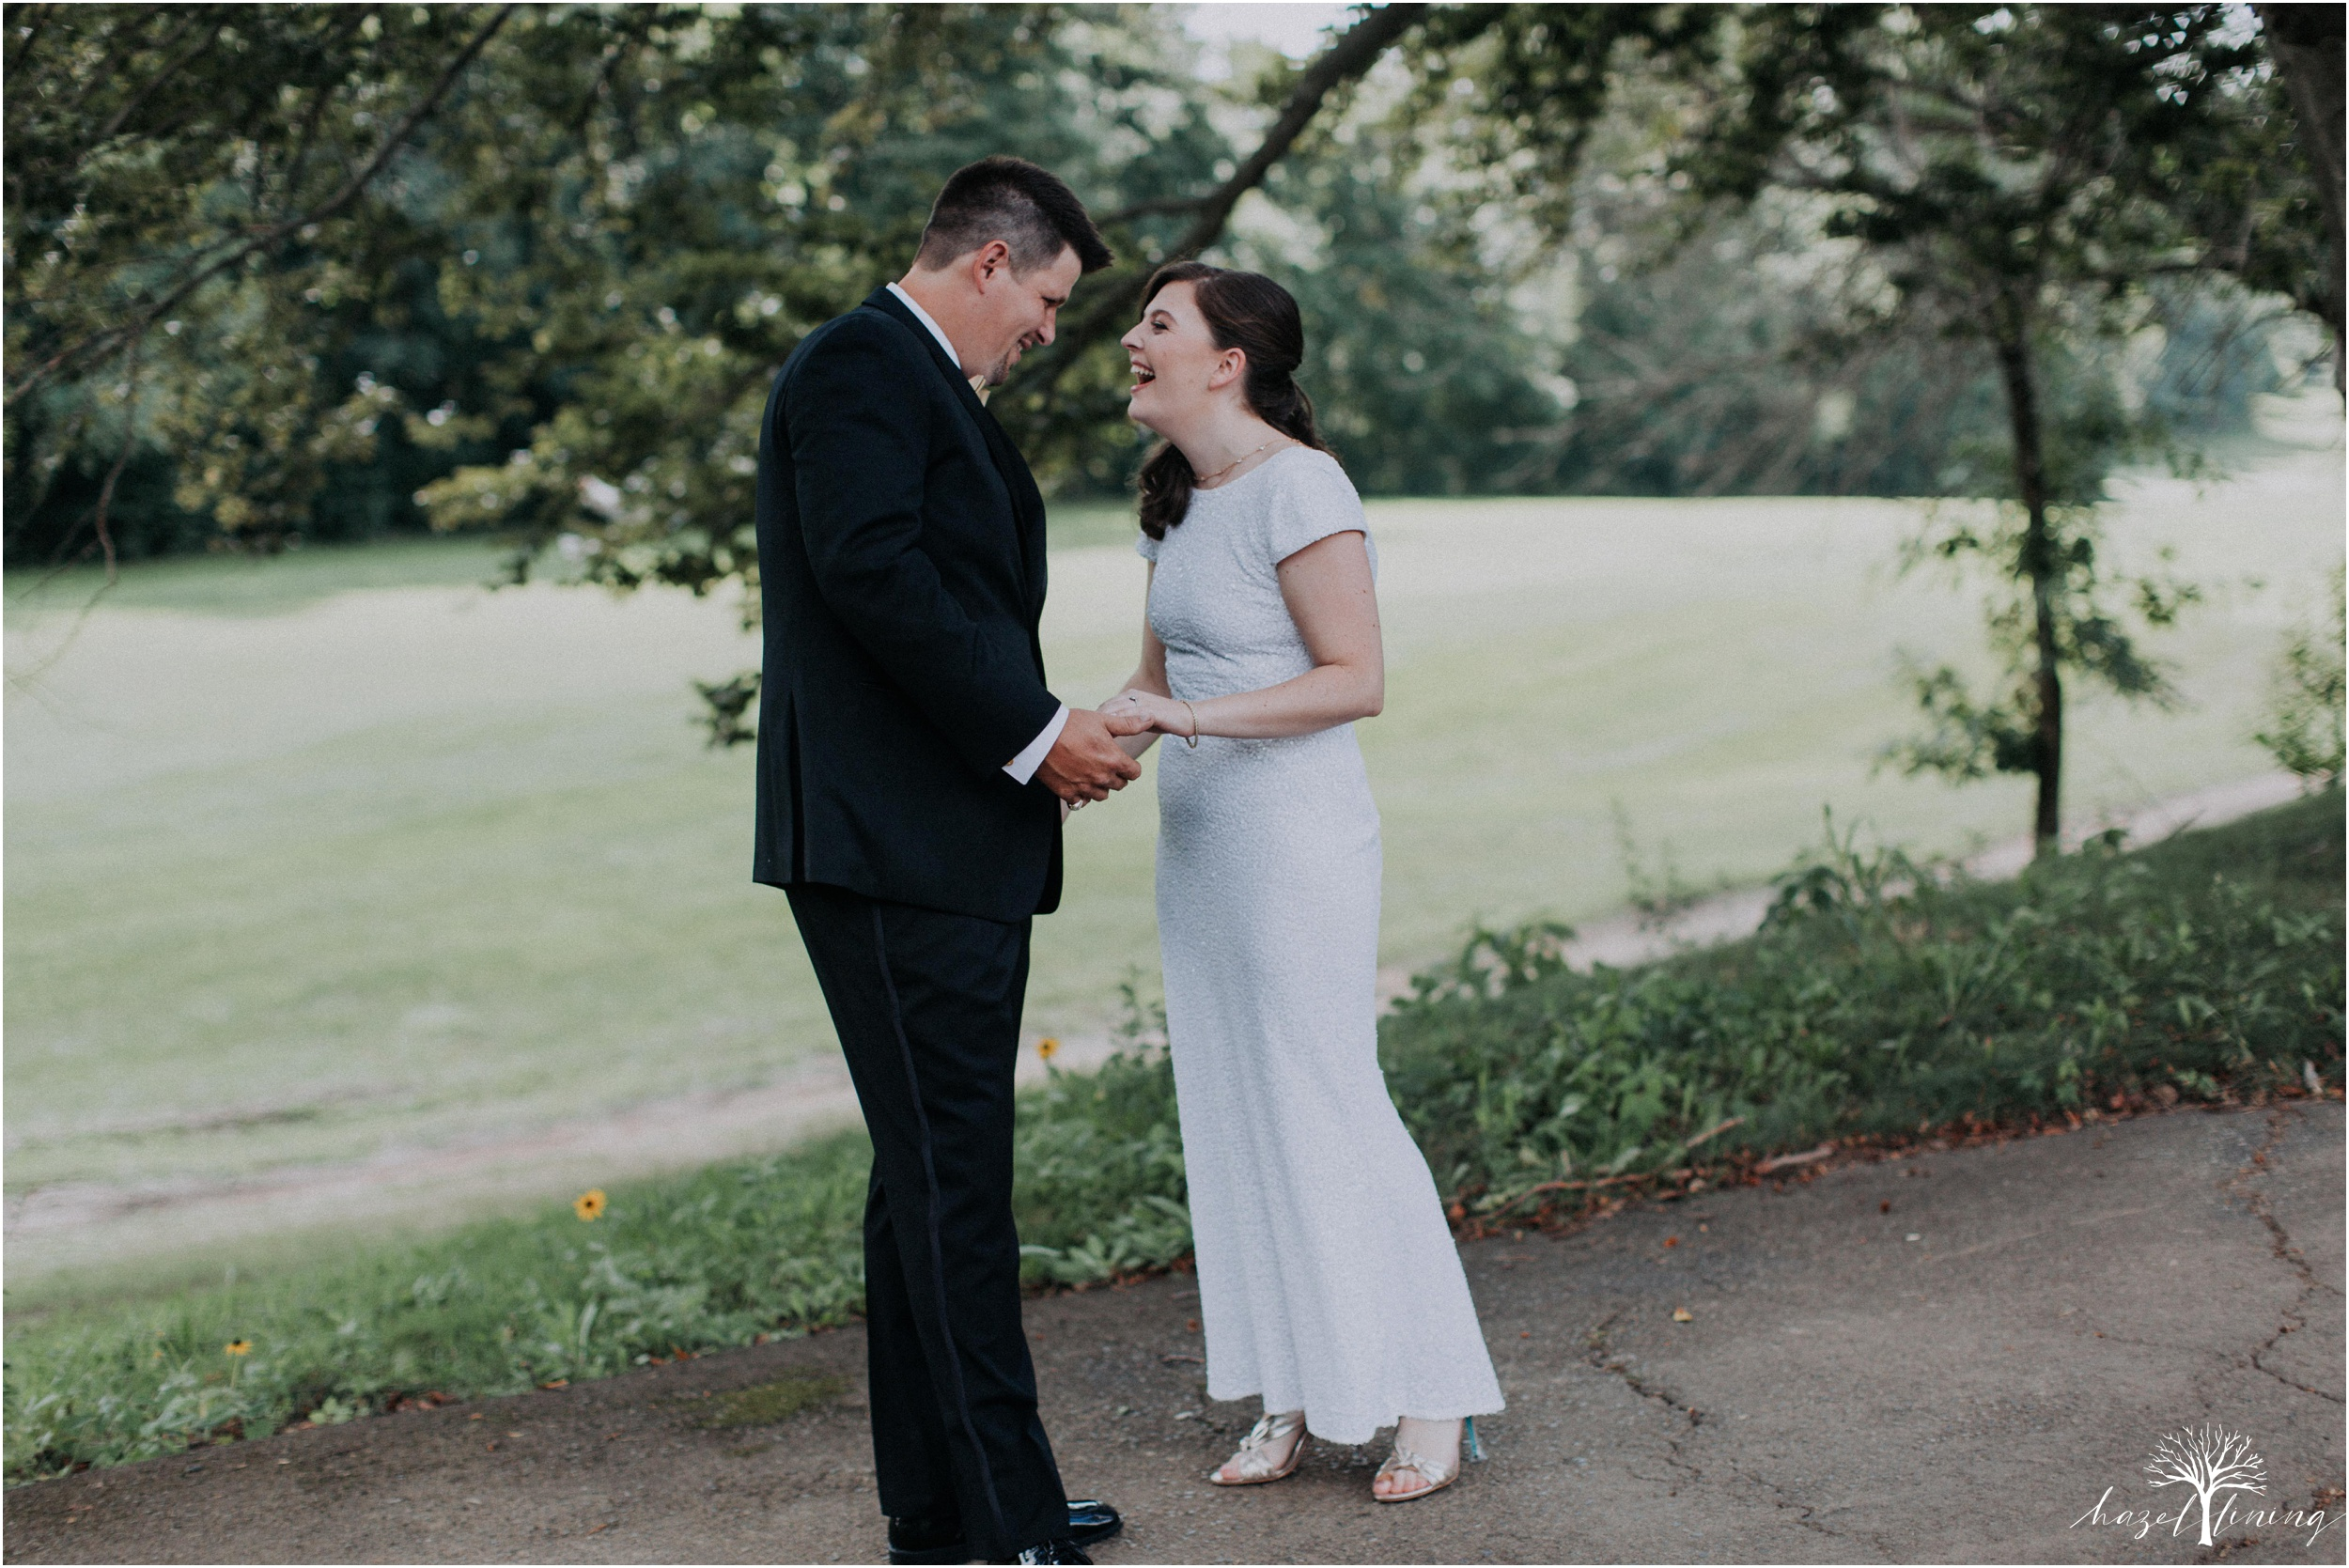 elizabeth-doelp-andrew-foreback-middletown-country-club-summer-langhorne-pennsylvania-wedding-hazel-lining-travel-wedding-elopement-photography_0037.jpg